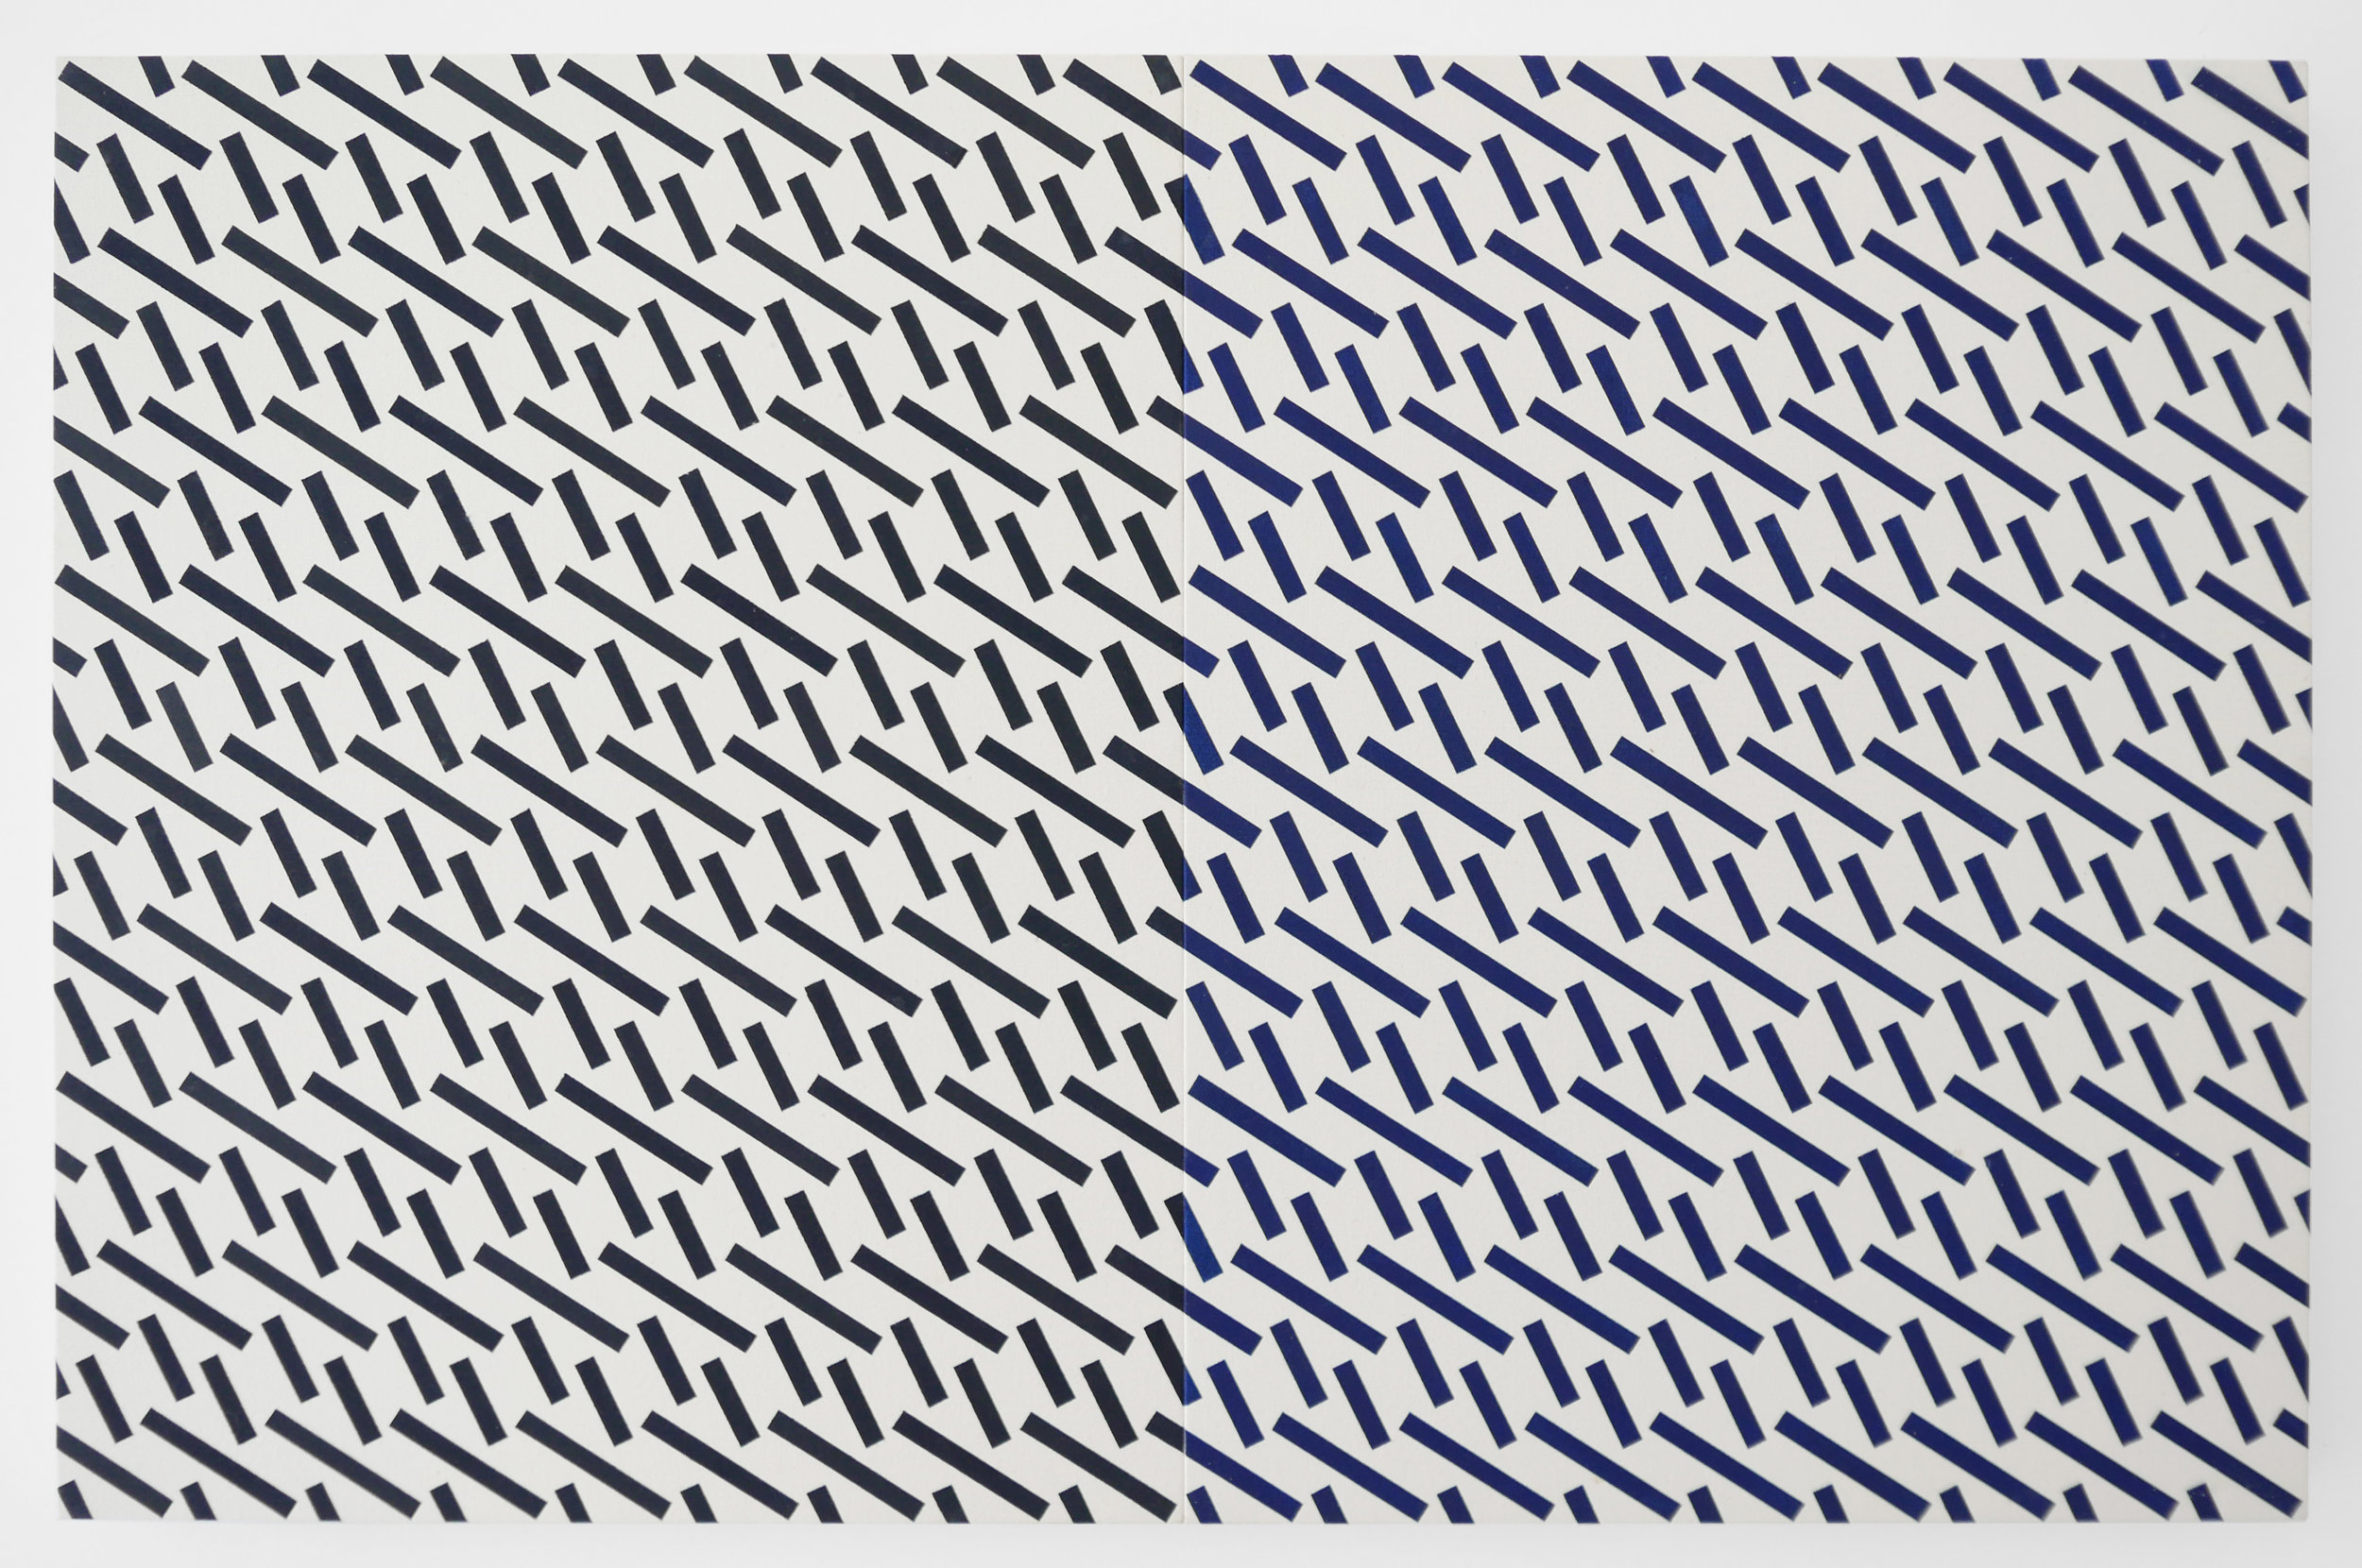 John M. Miller, 'Untitled', 2009, Acrylic Resin on Raw Canvas, 26.75 x 41.25 inches_2.jpg